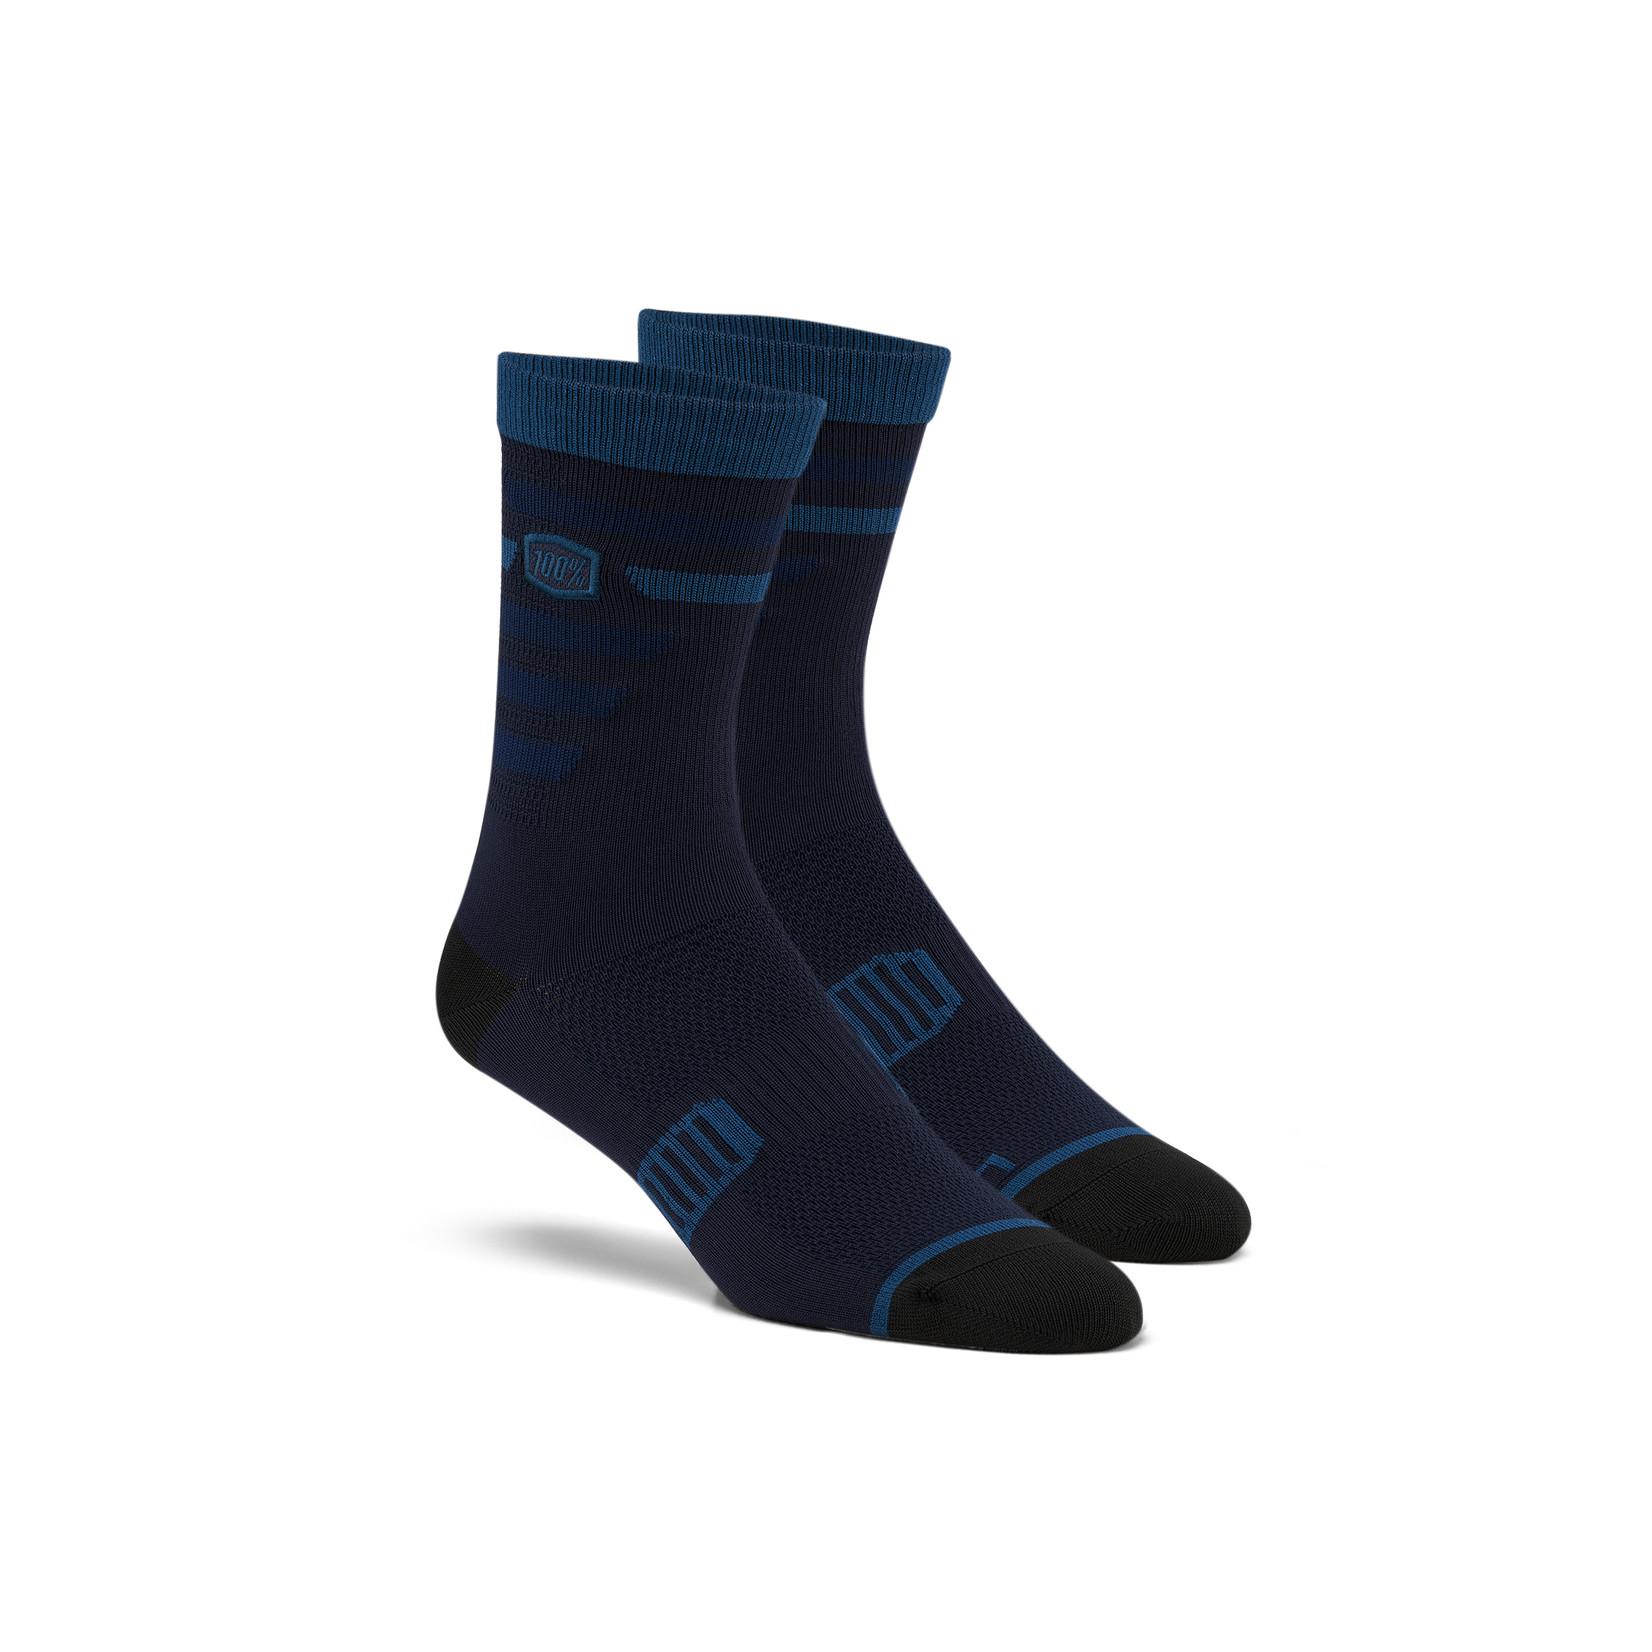 100% 100% Advocate Performance Socks